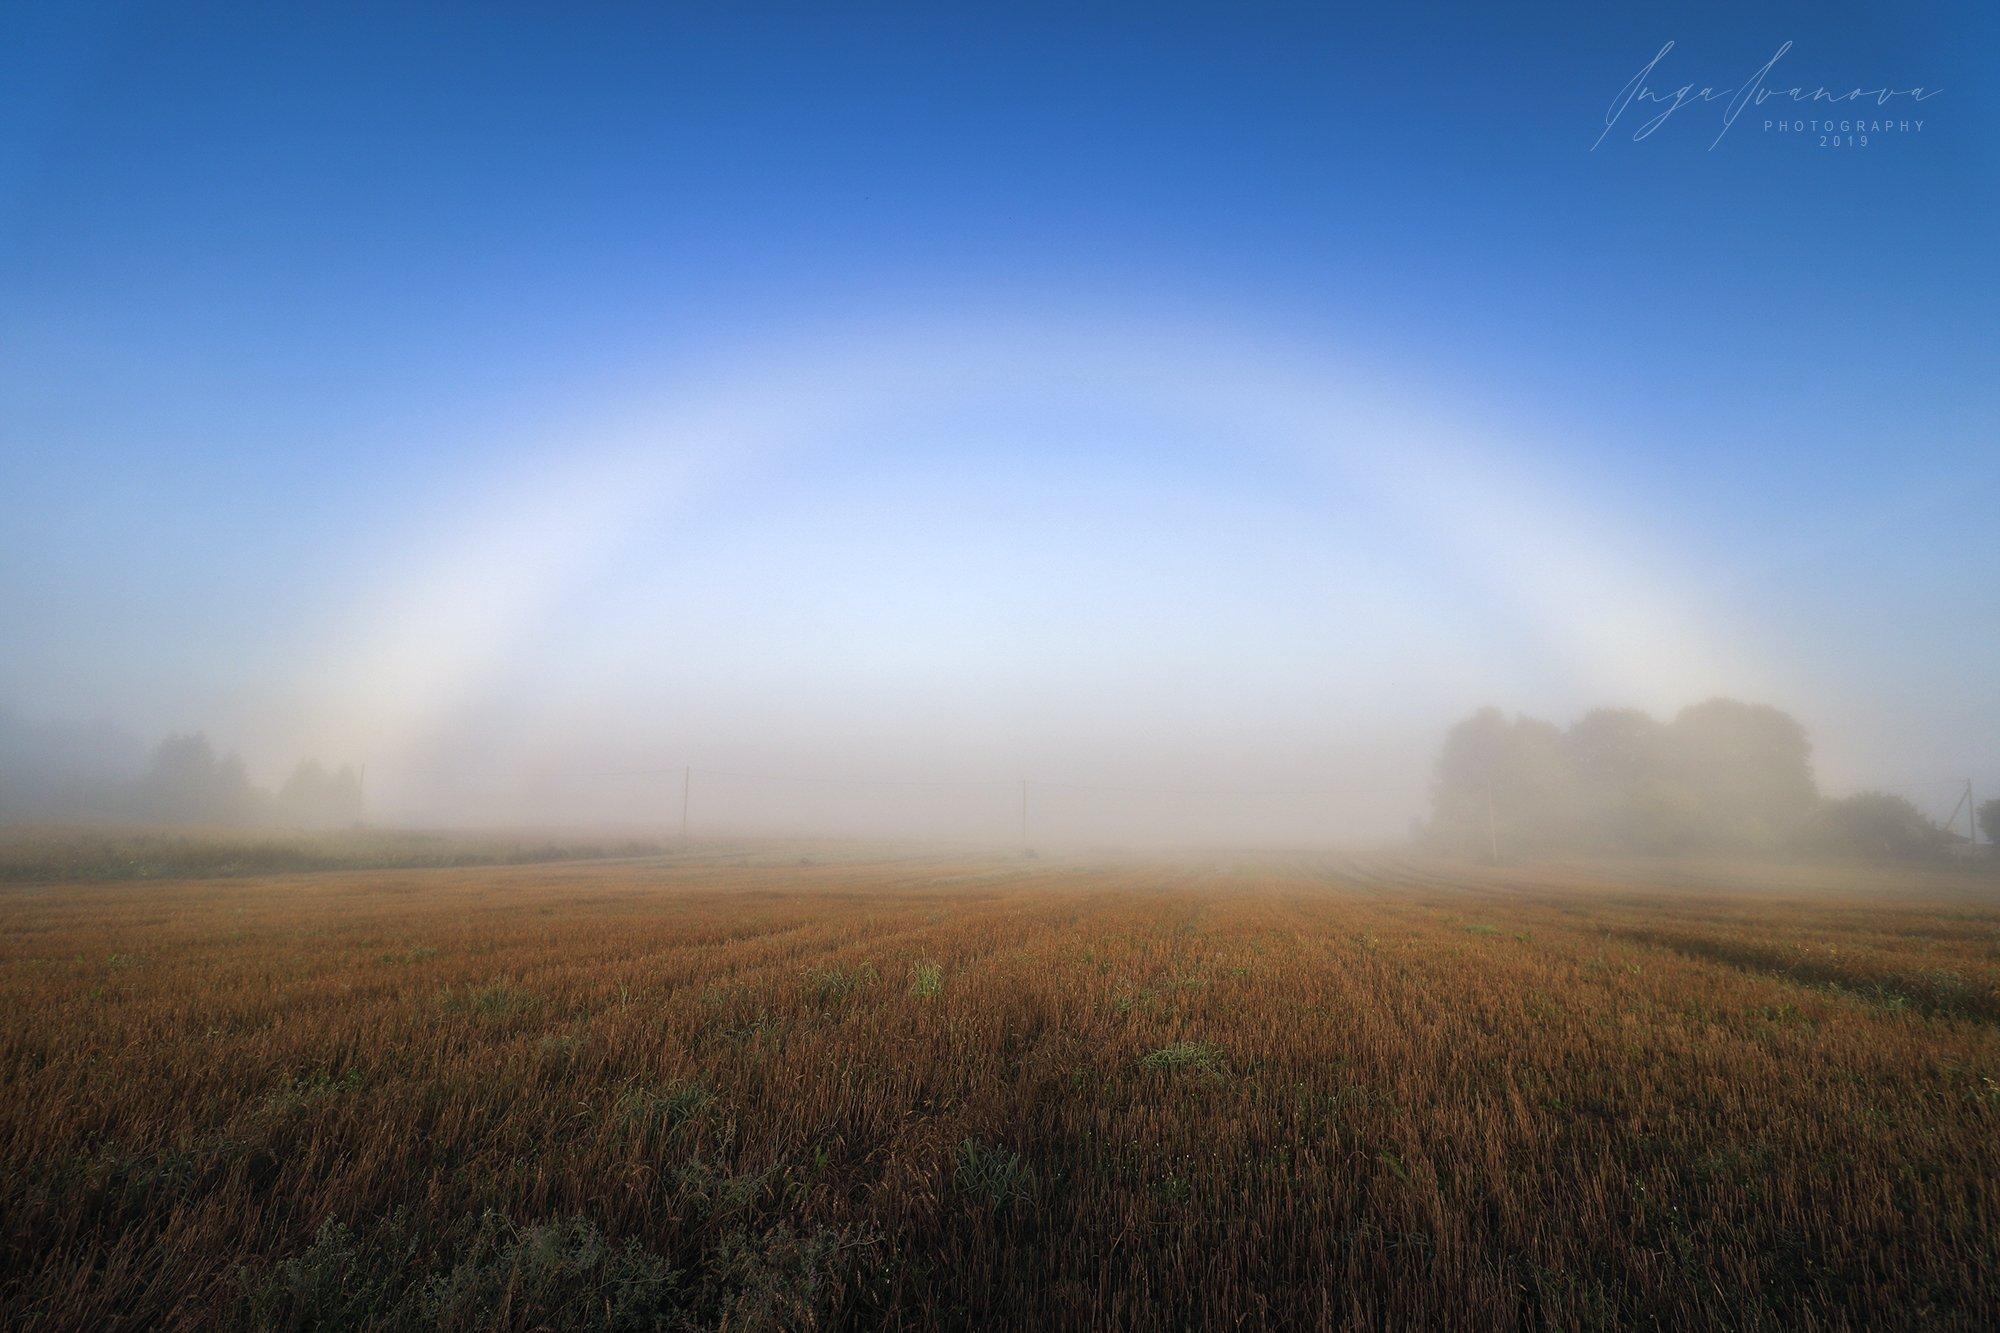 белая радуга, Инга Иванова